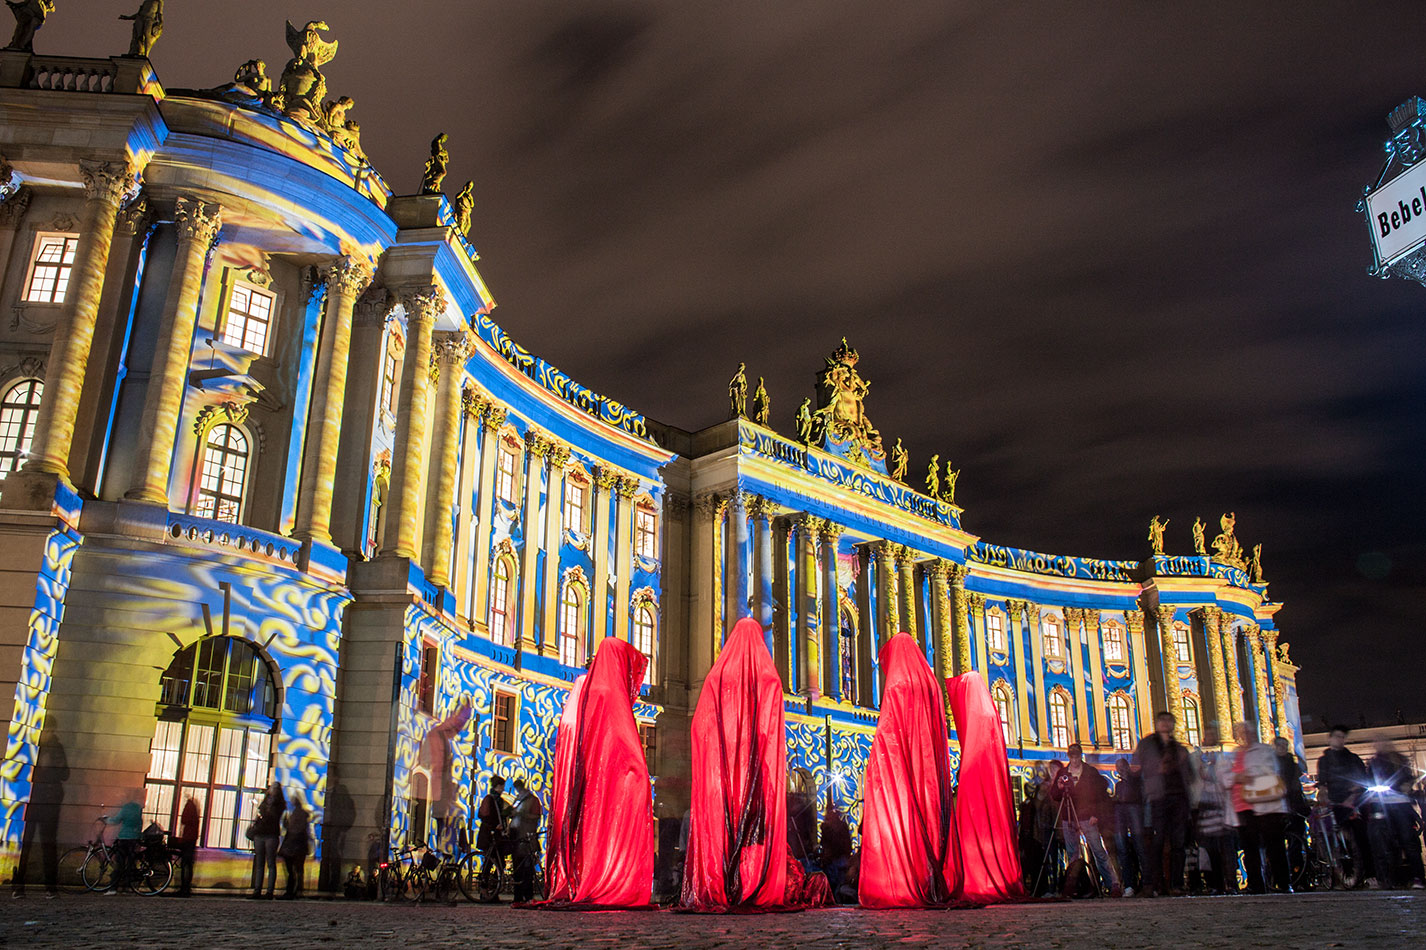 Festival of Lights 2017: Let's Light Up the World with Berlin festival of lights 2017 Festival of Lights 2017: Let's Light Up the World with Berlin Festival of Lights 2017 Lets Light Up the World with Berlin 5